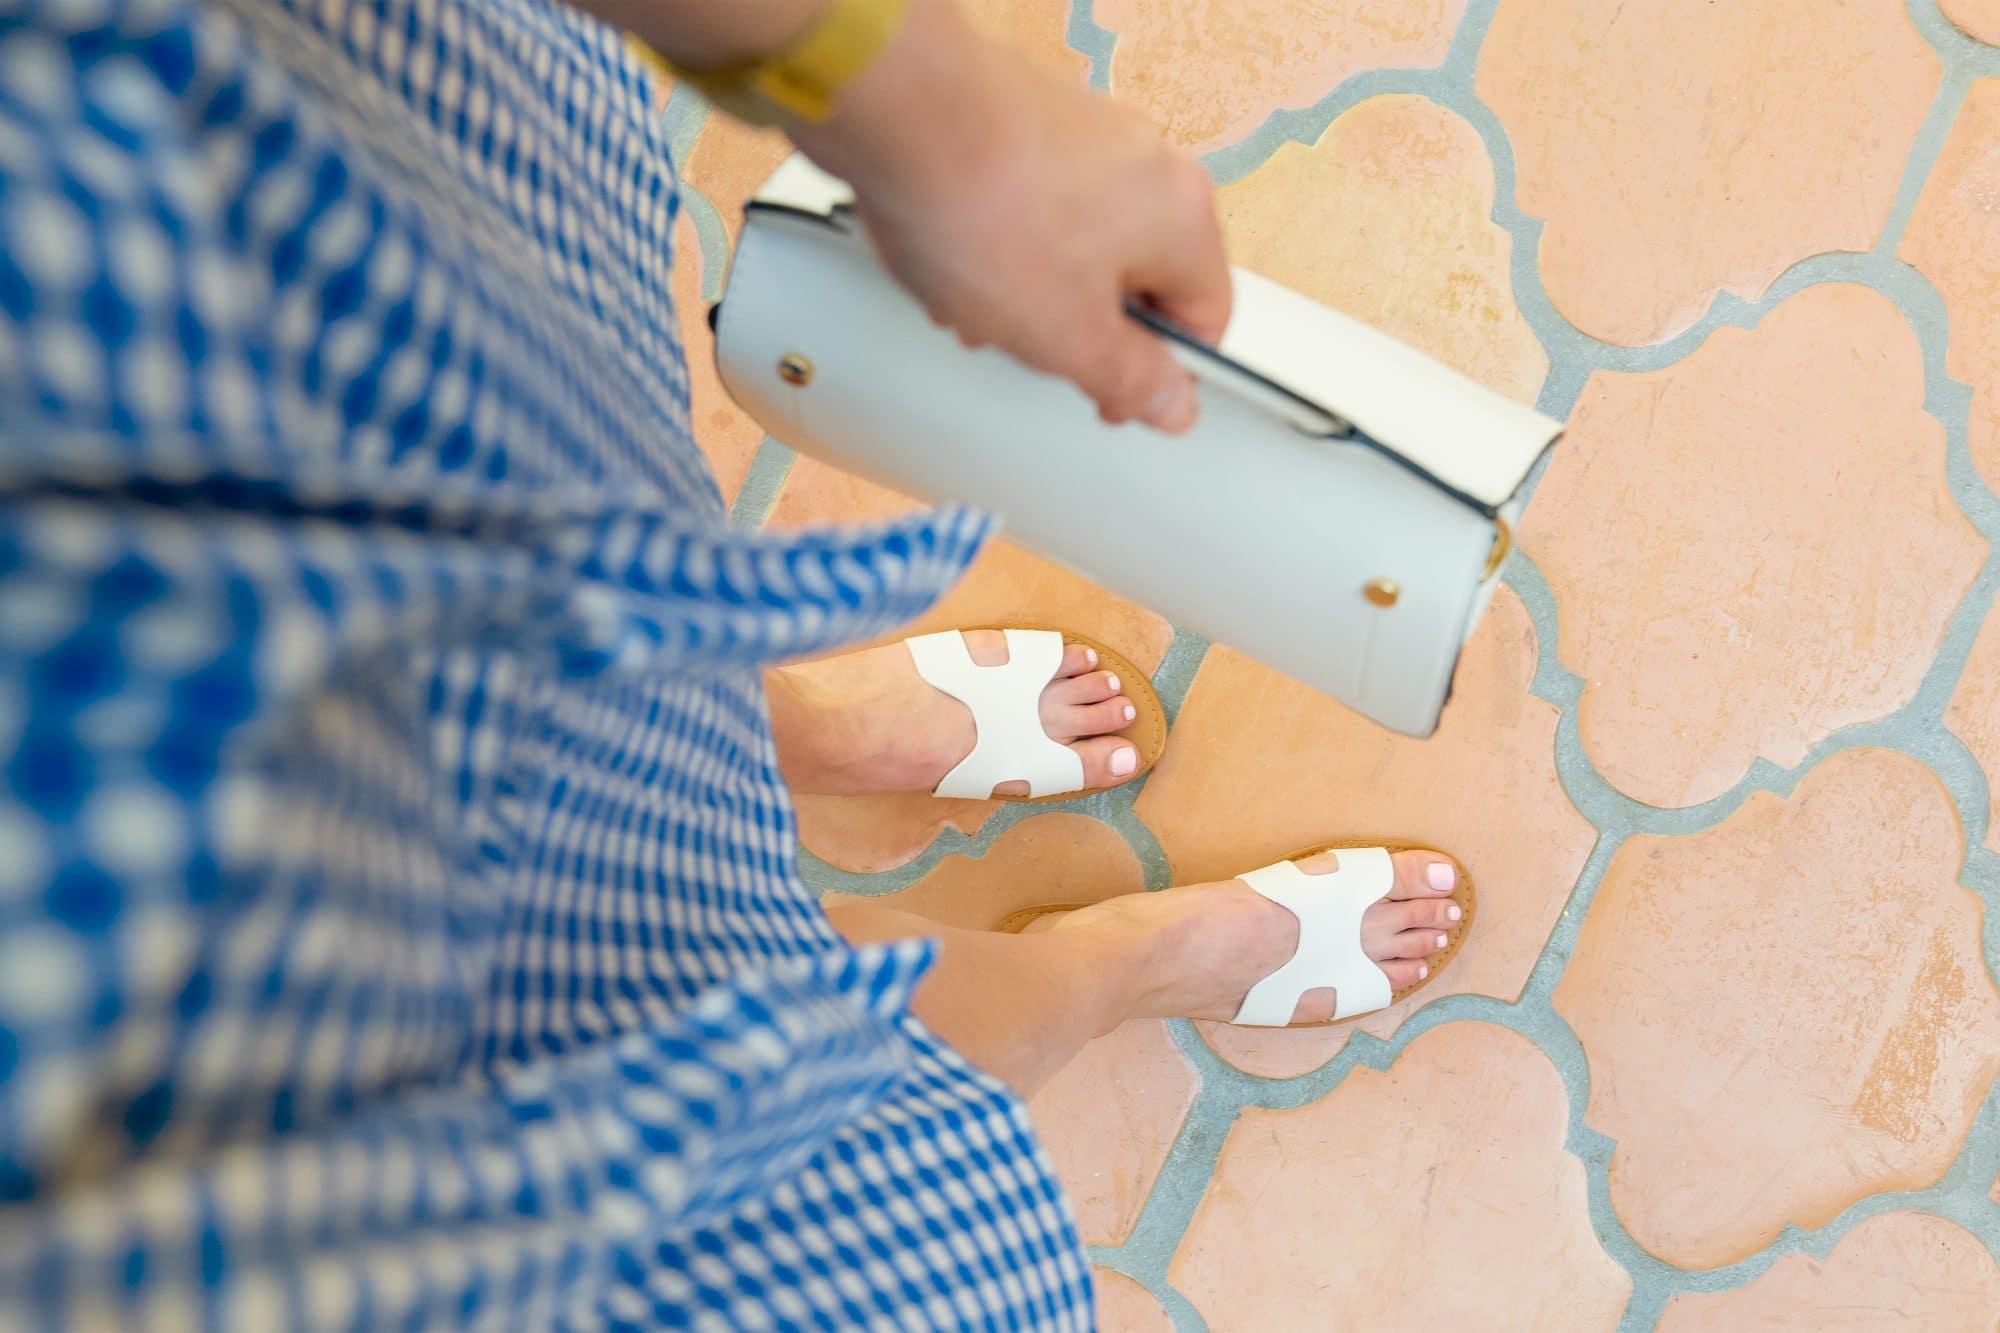 Head to Toe Under $100 Target Look | www.ashleybrookedesigns.com